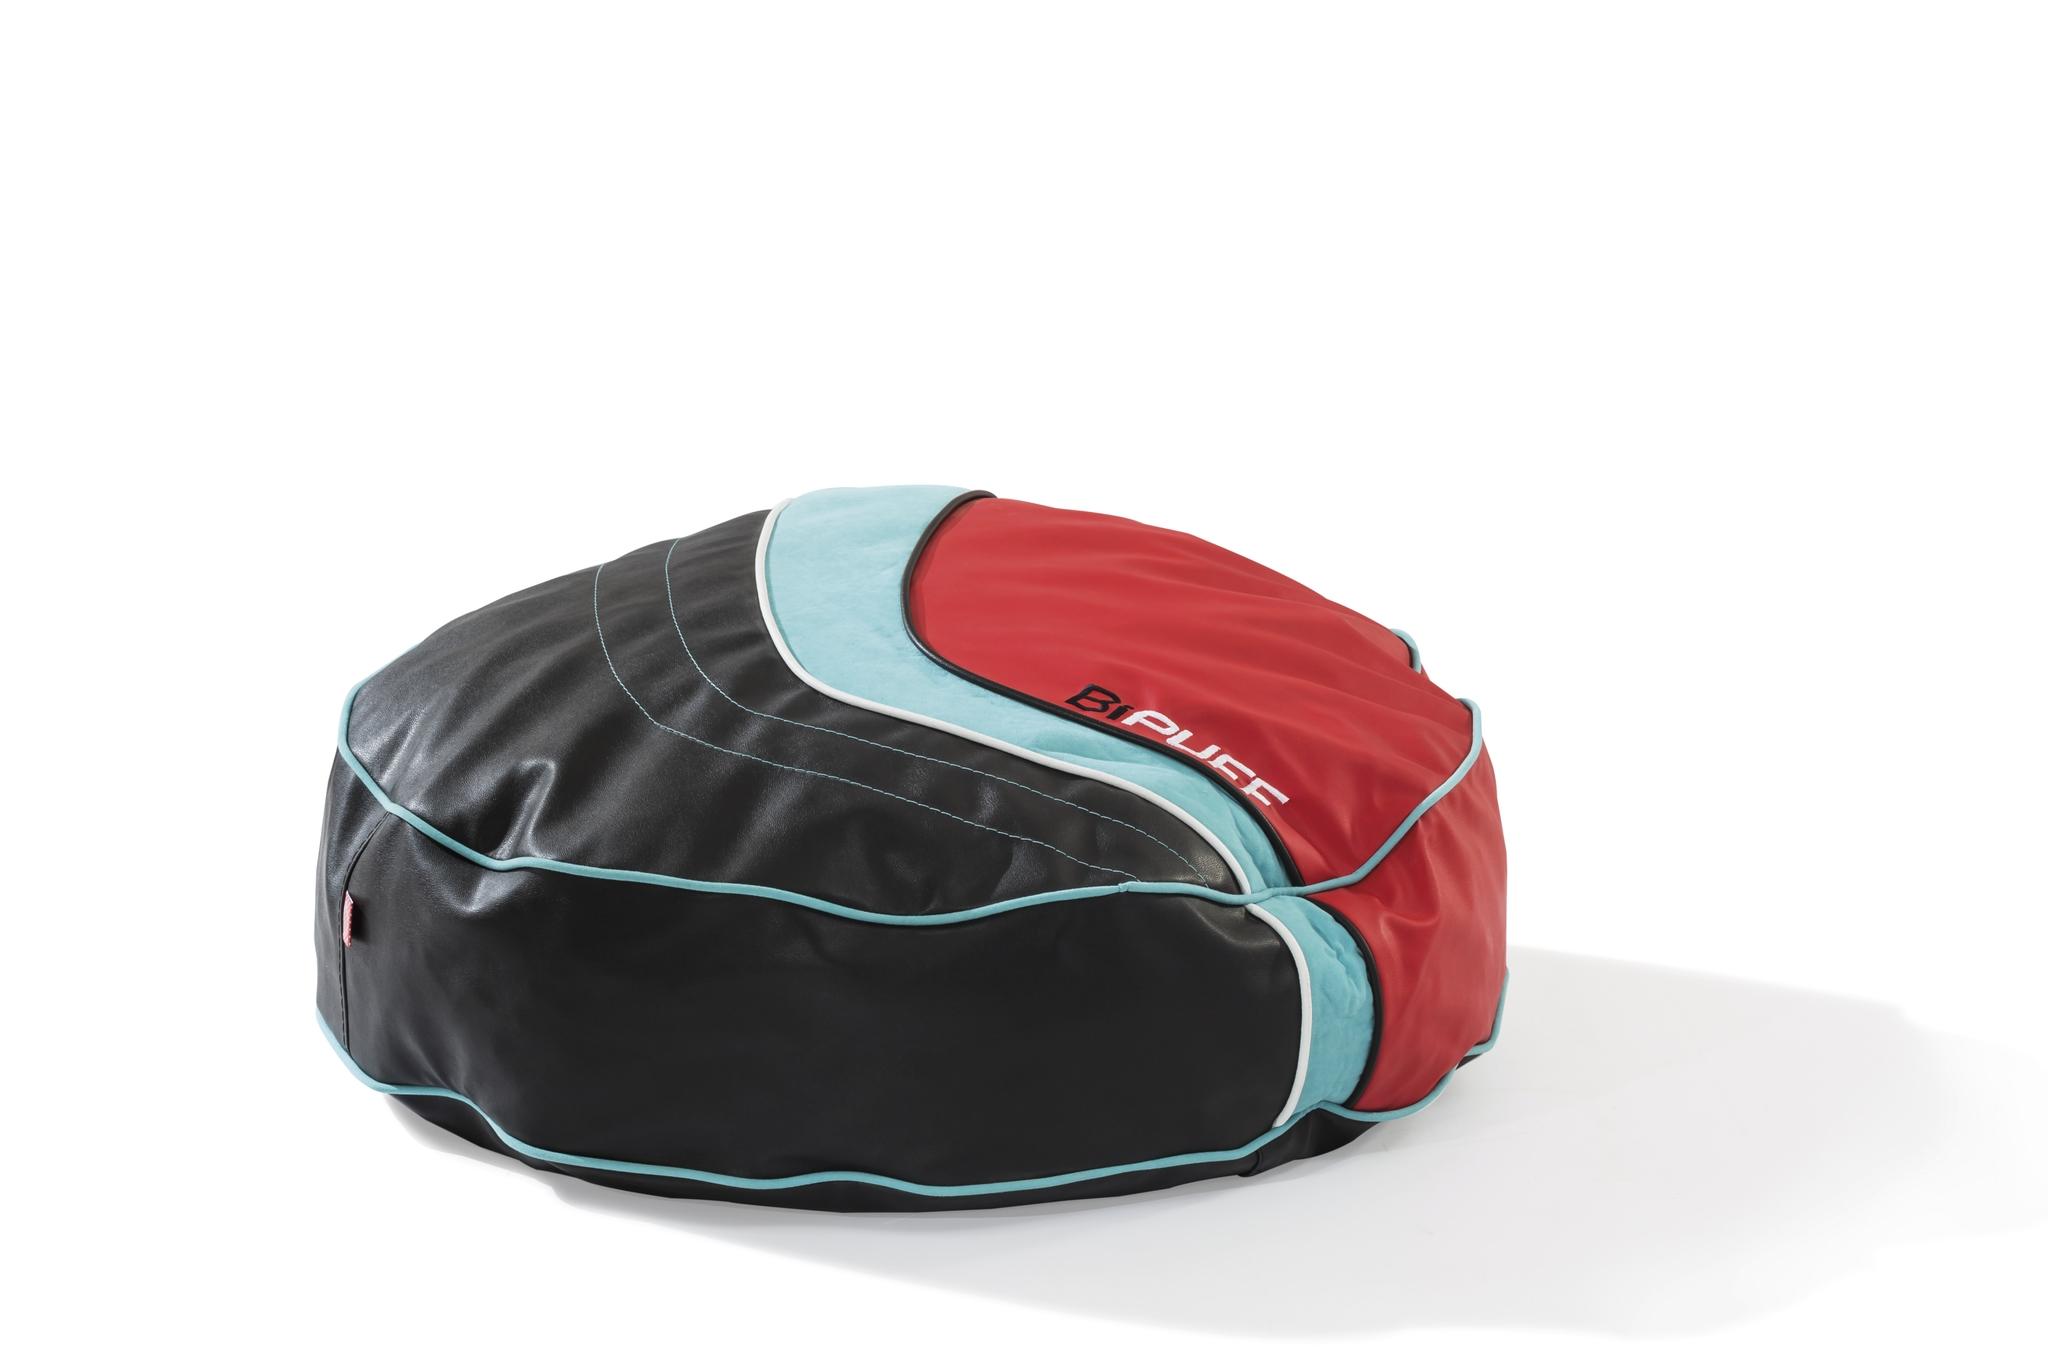 Taburet pentru copii tapitat cu piele ecologica Biconcept Red / Black l82xA82xH20 cm